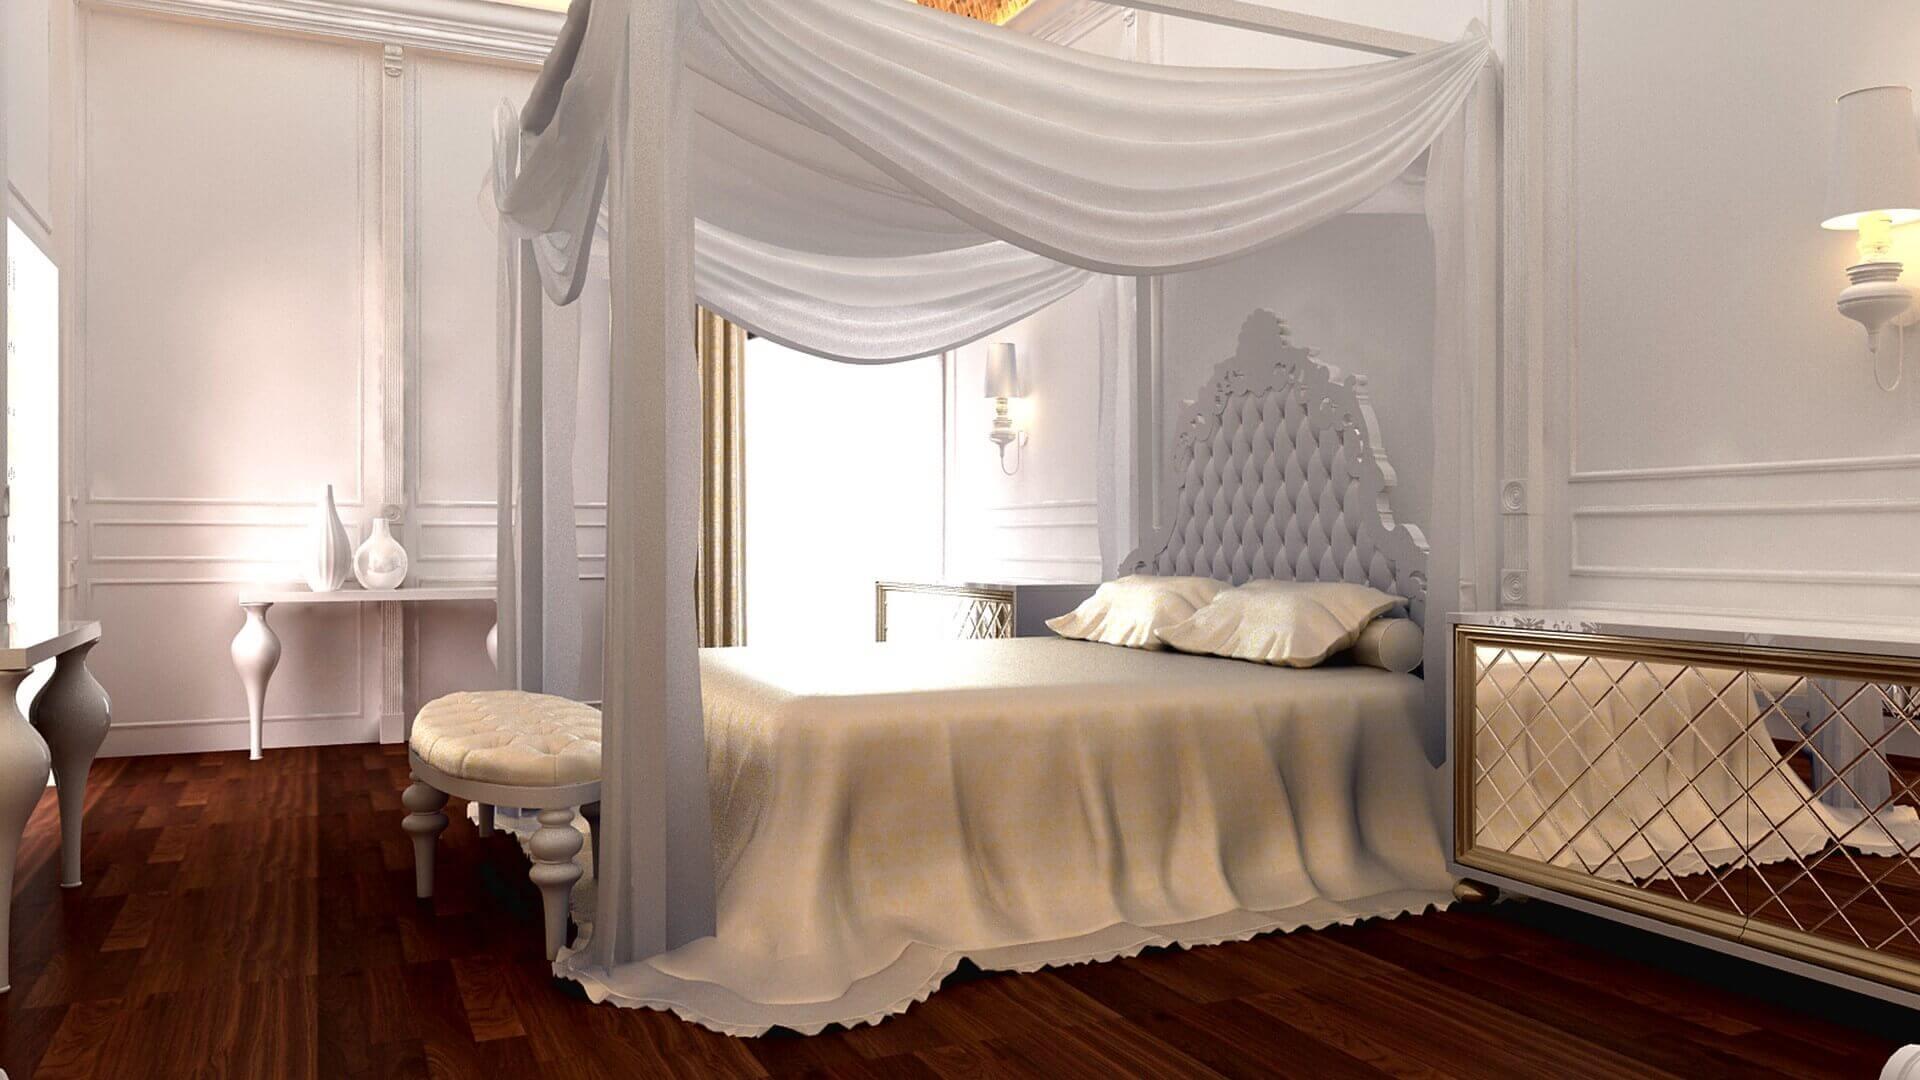 villa dekorasyonu 3027 Oran Rezidans Konutlar